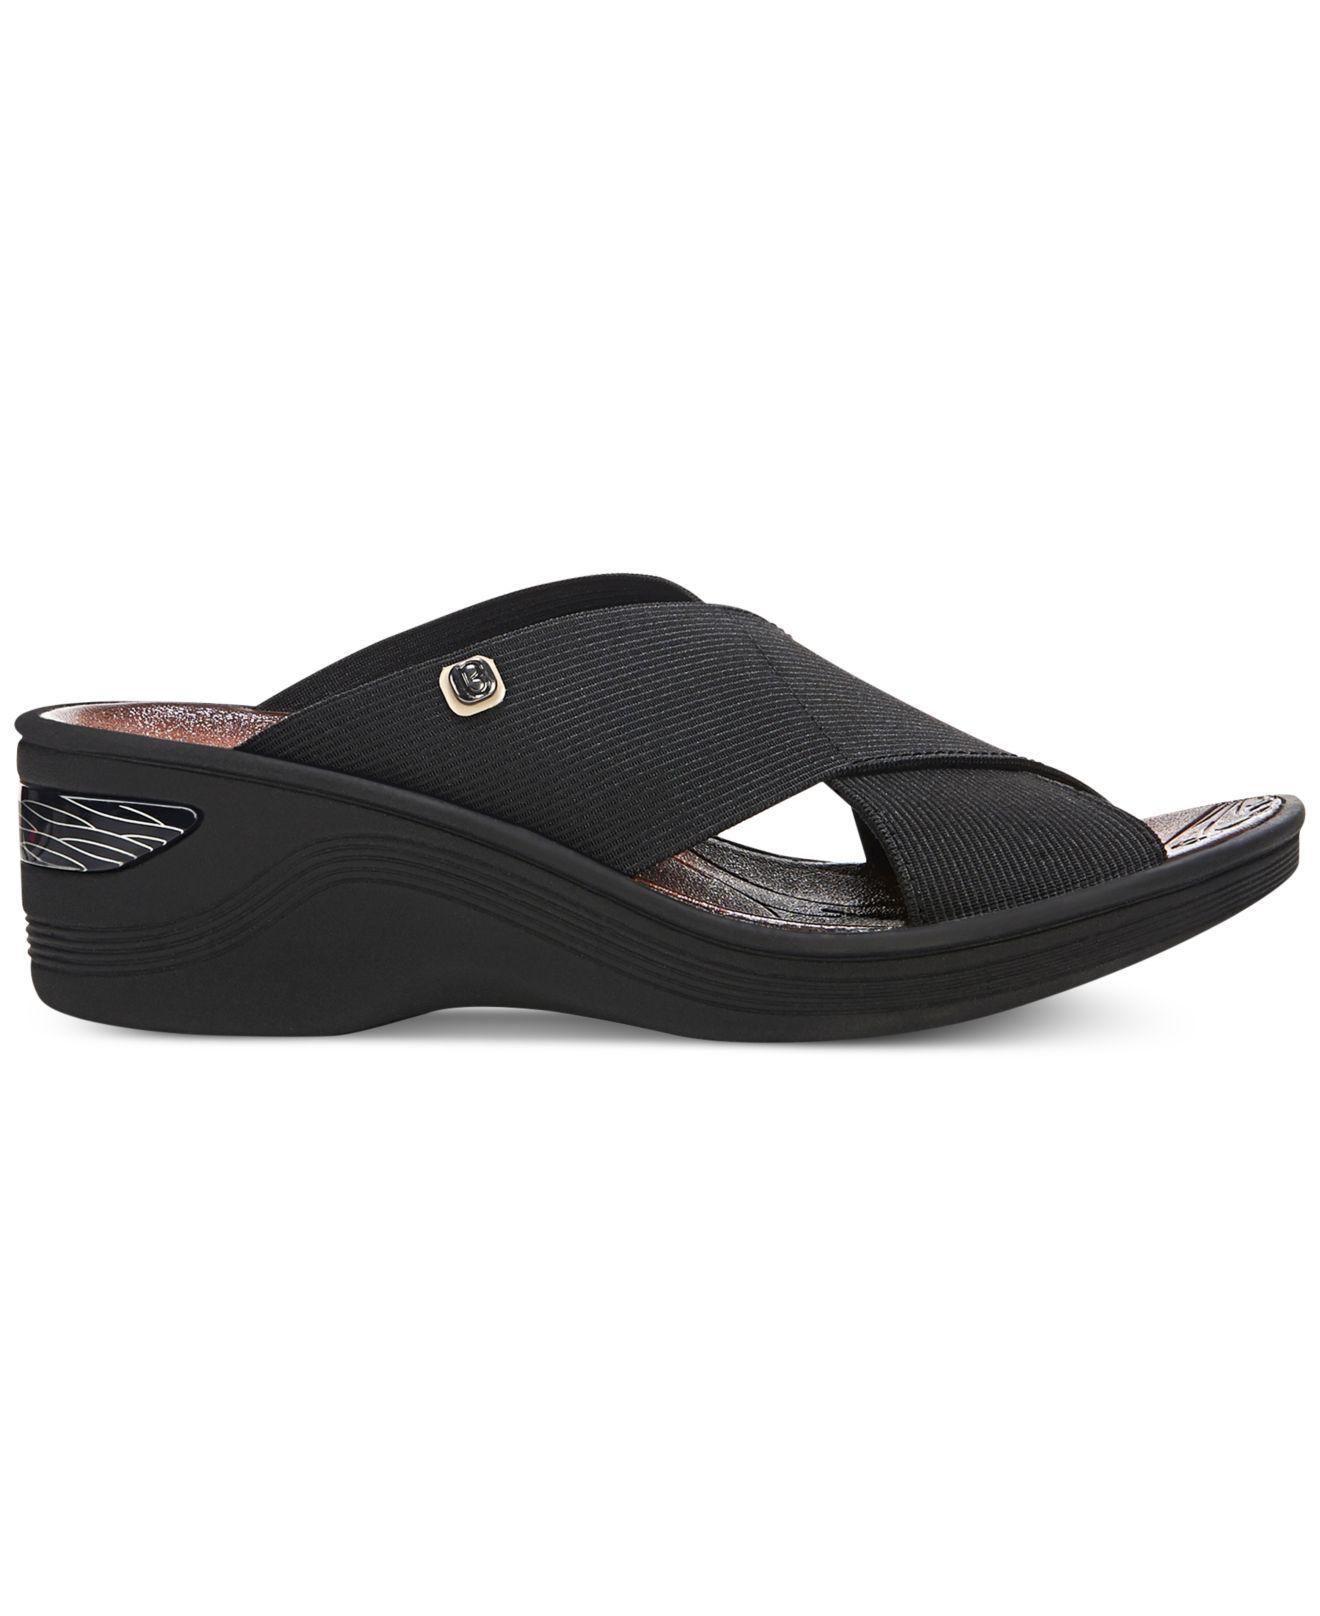 3b0eb3b2269 Lyst - Bzees Desire Sandals in Black